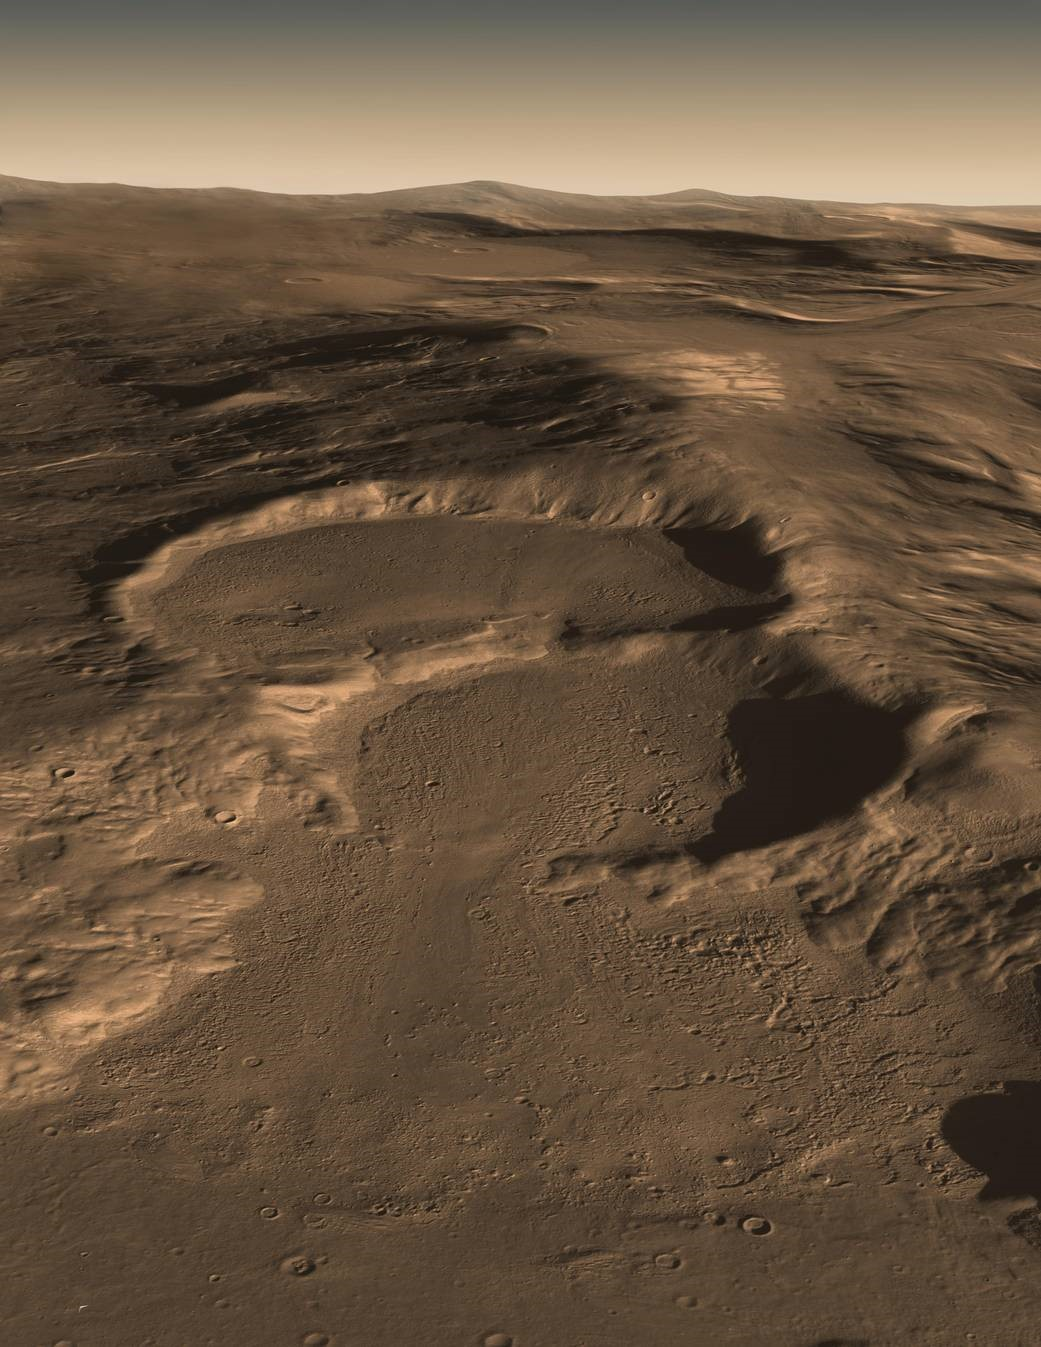 Crédito de la imagen: NASA / JPL-Caltech / UTA / UA / MSSS / ESA / DLR / JPL Solar System Visualization Project.